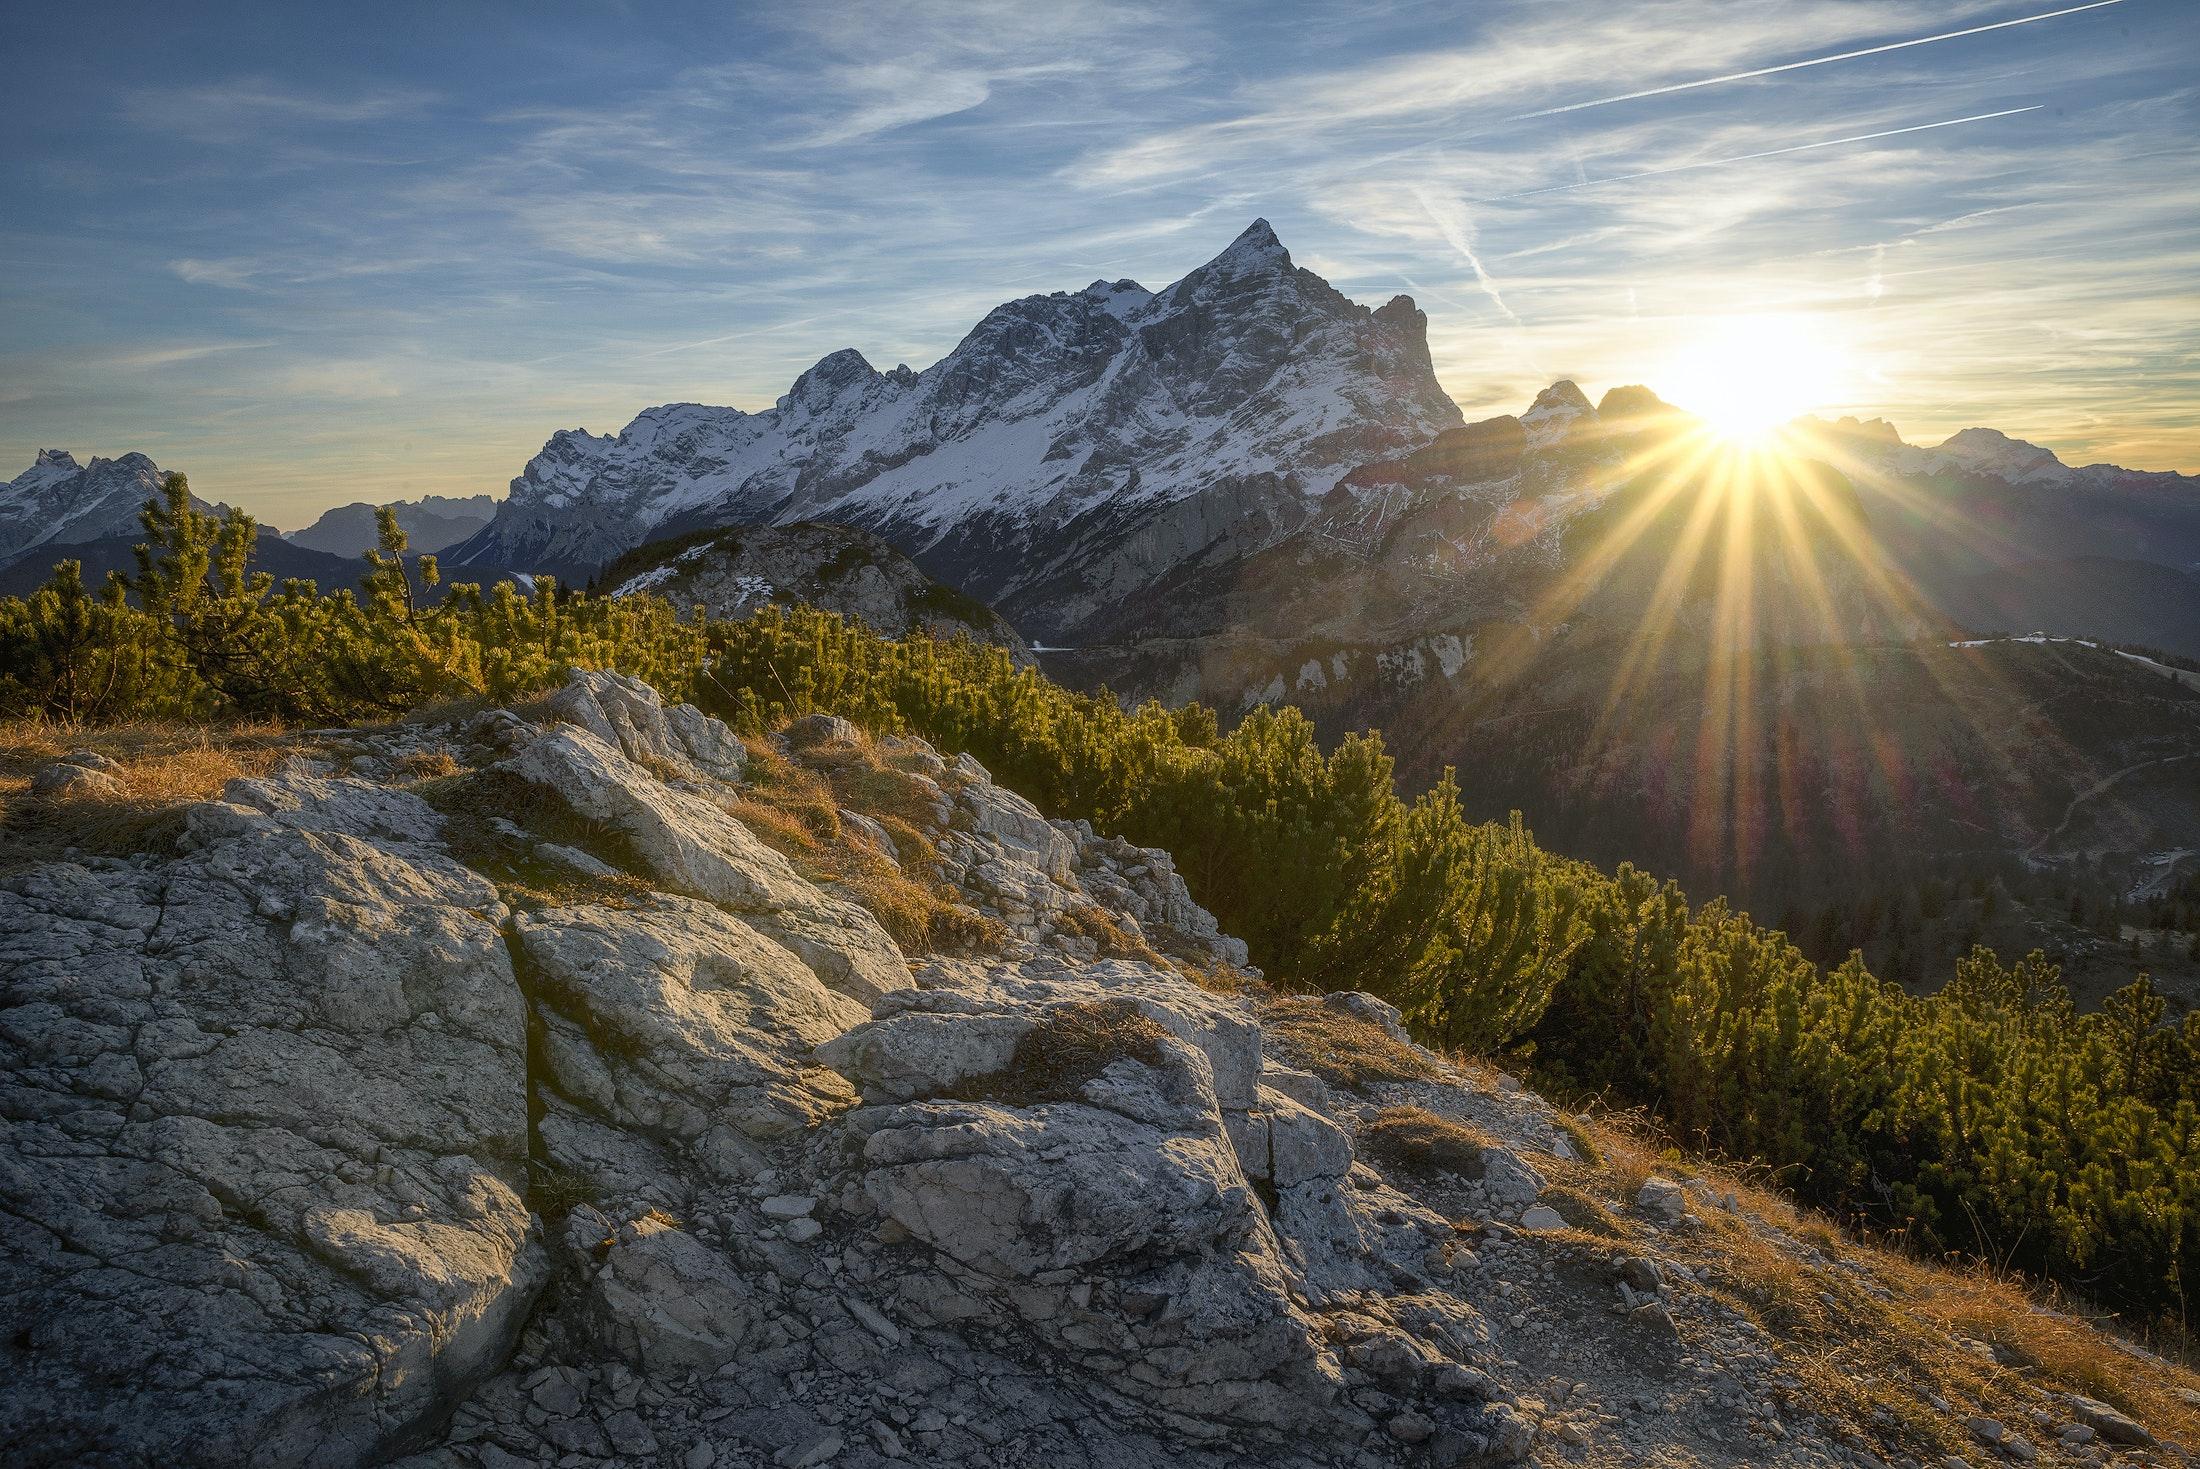 1000+ great bright photos · pexels · free stock photos